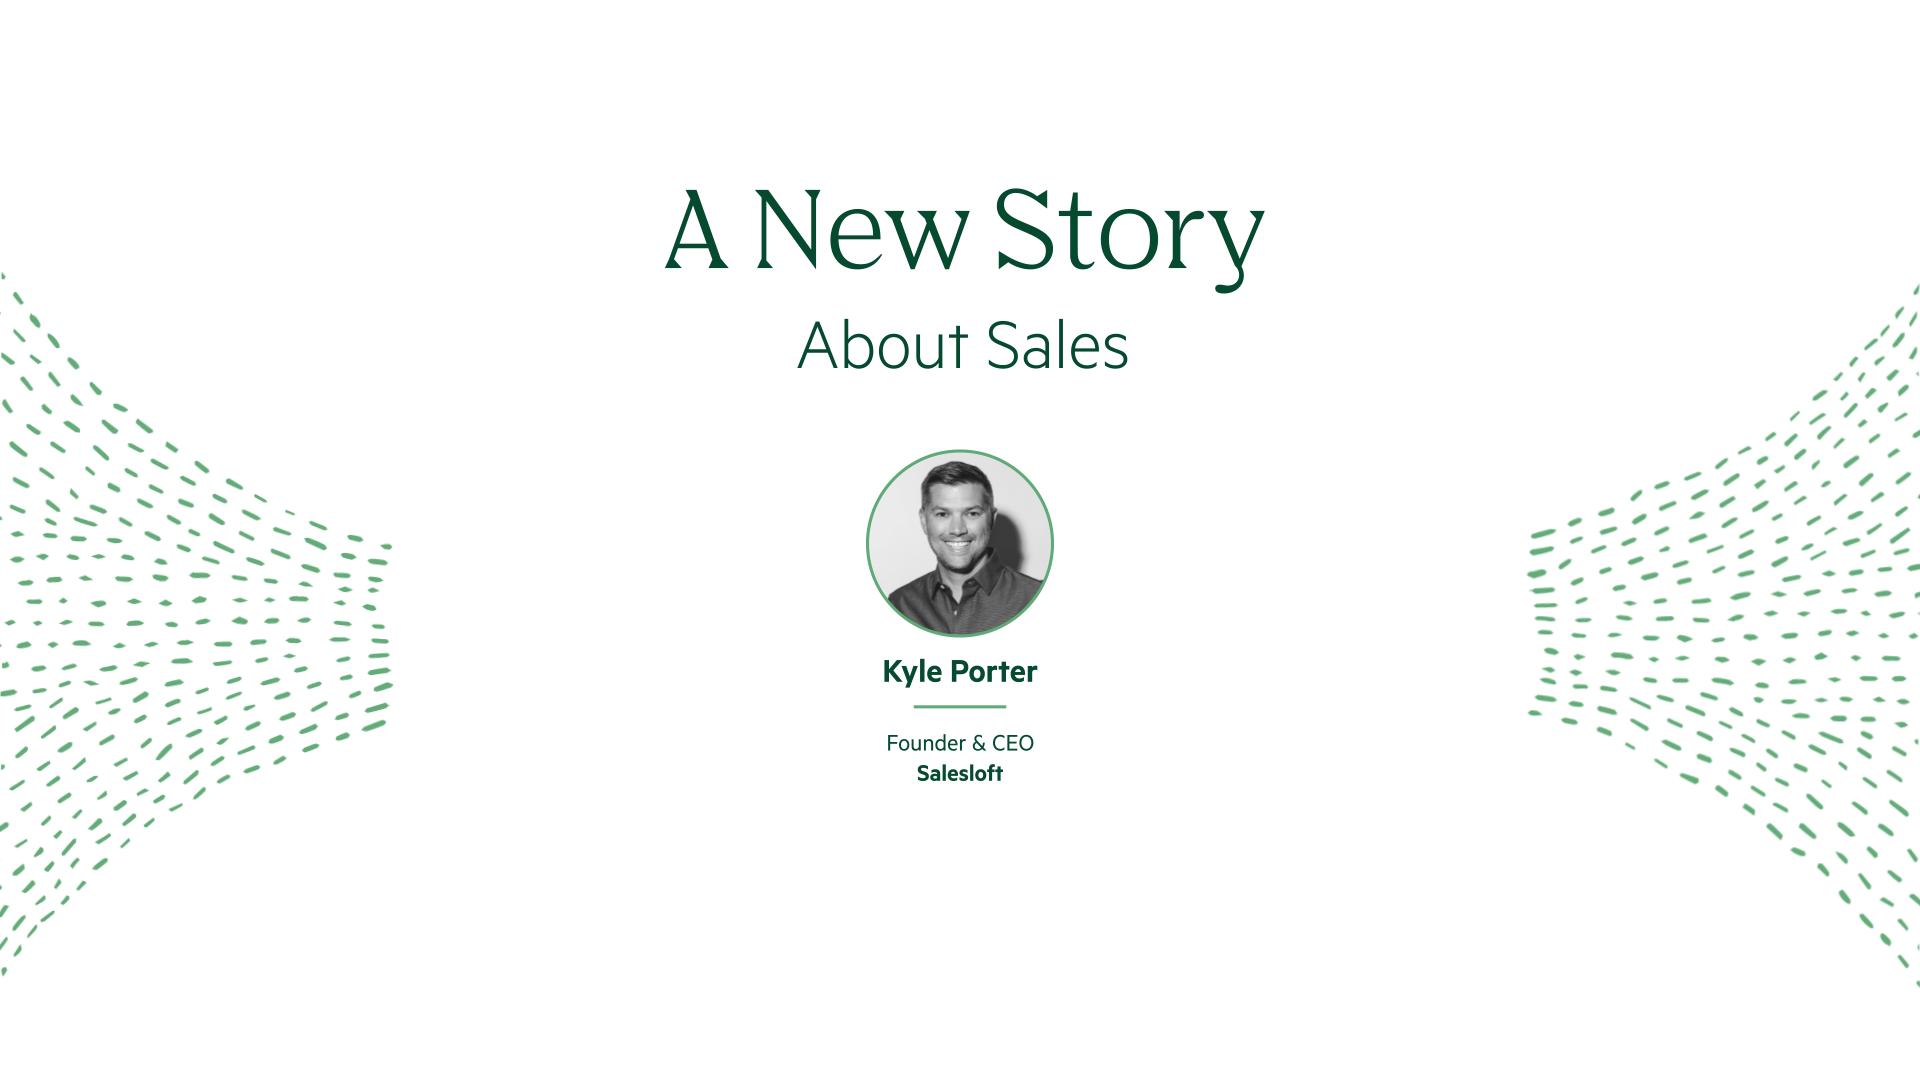 Kyle Porter A New Story About Sales Keynote